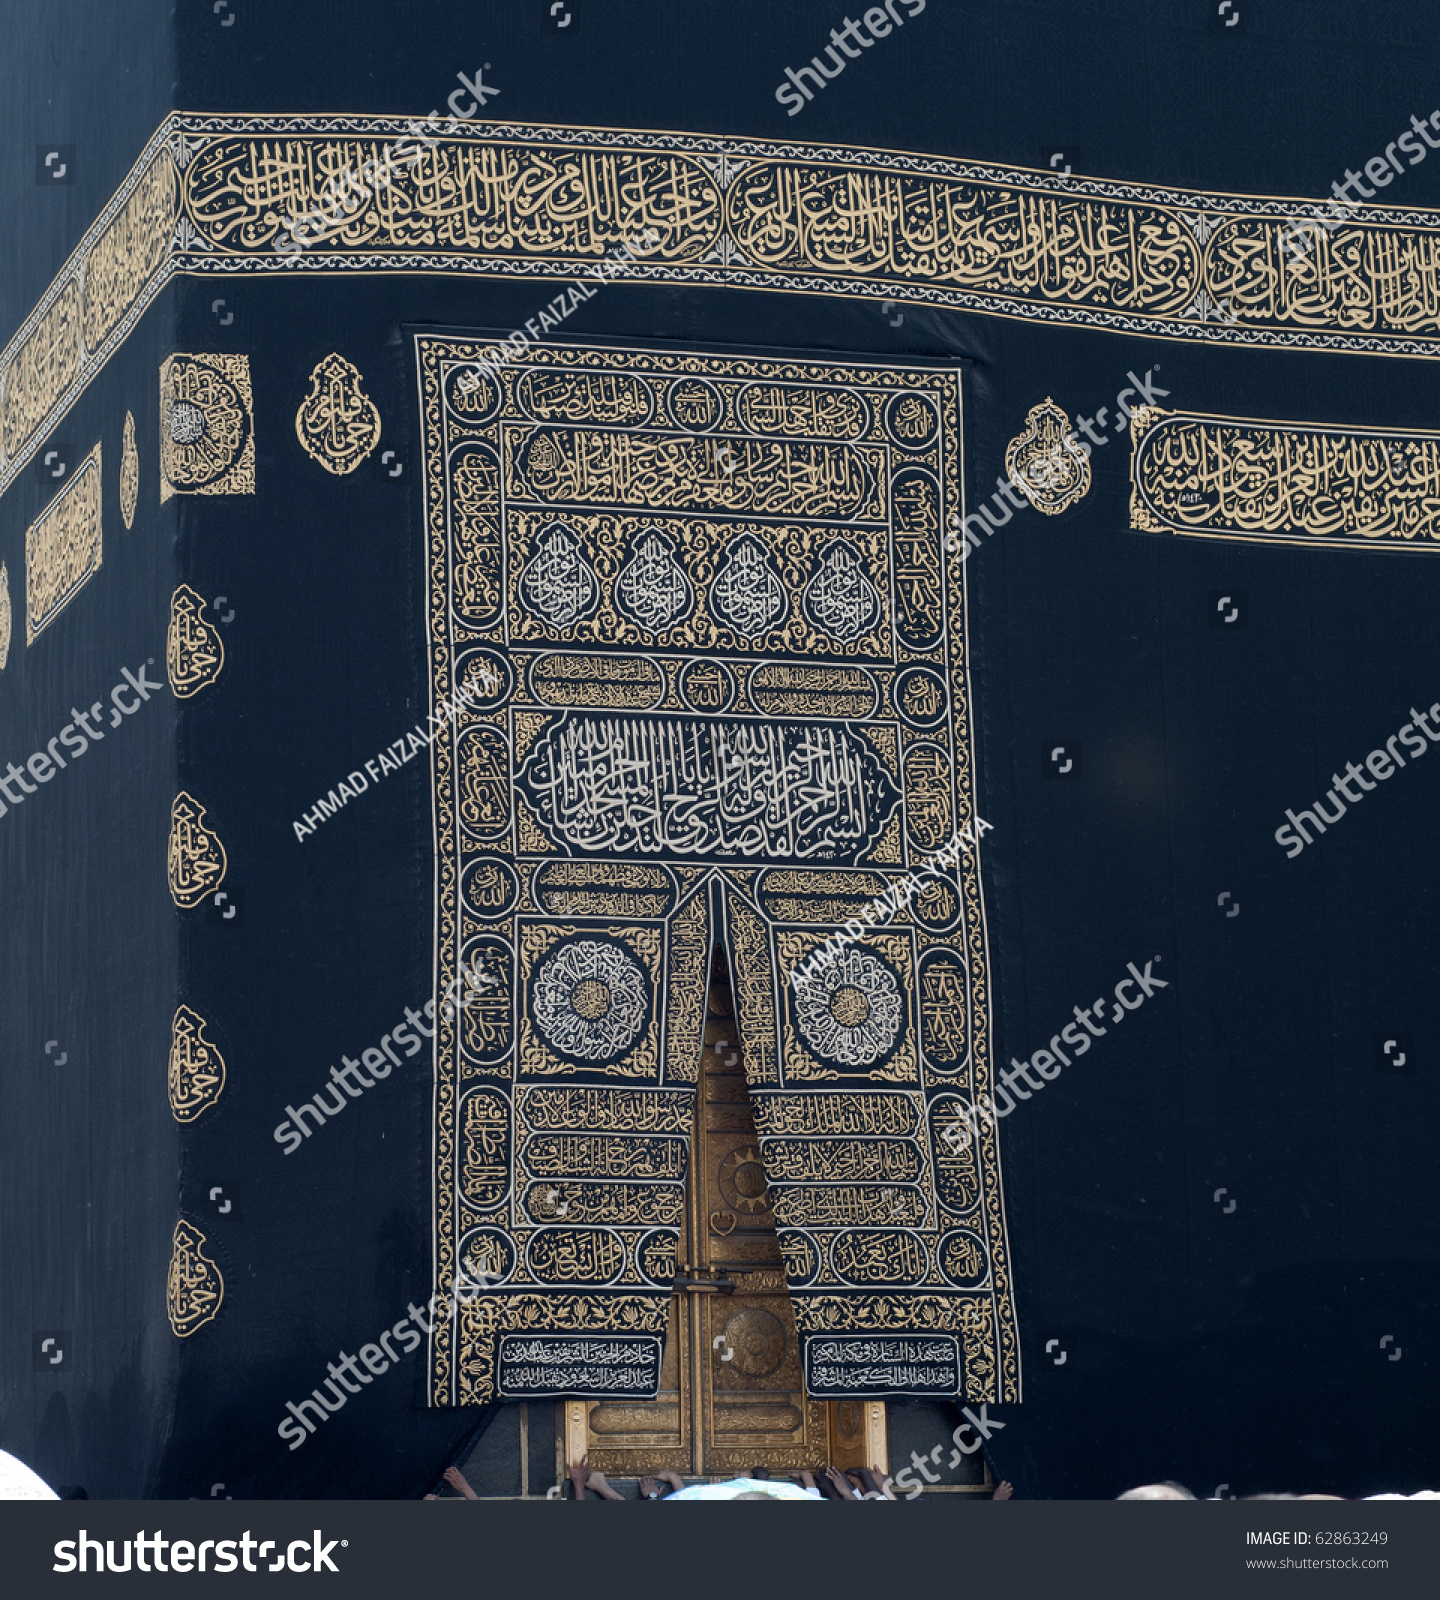 Close up of cloth and golden door of Kaaba in Makkah Saudi Arabia.  sc 1 st  Shutterstock & Close Cloth Golden Door Kaaba Makkah Stock Photo (Edit Now ...